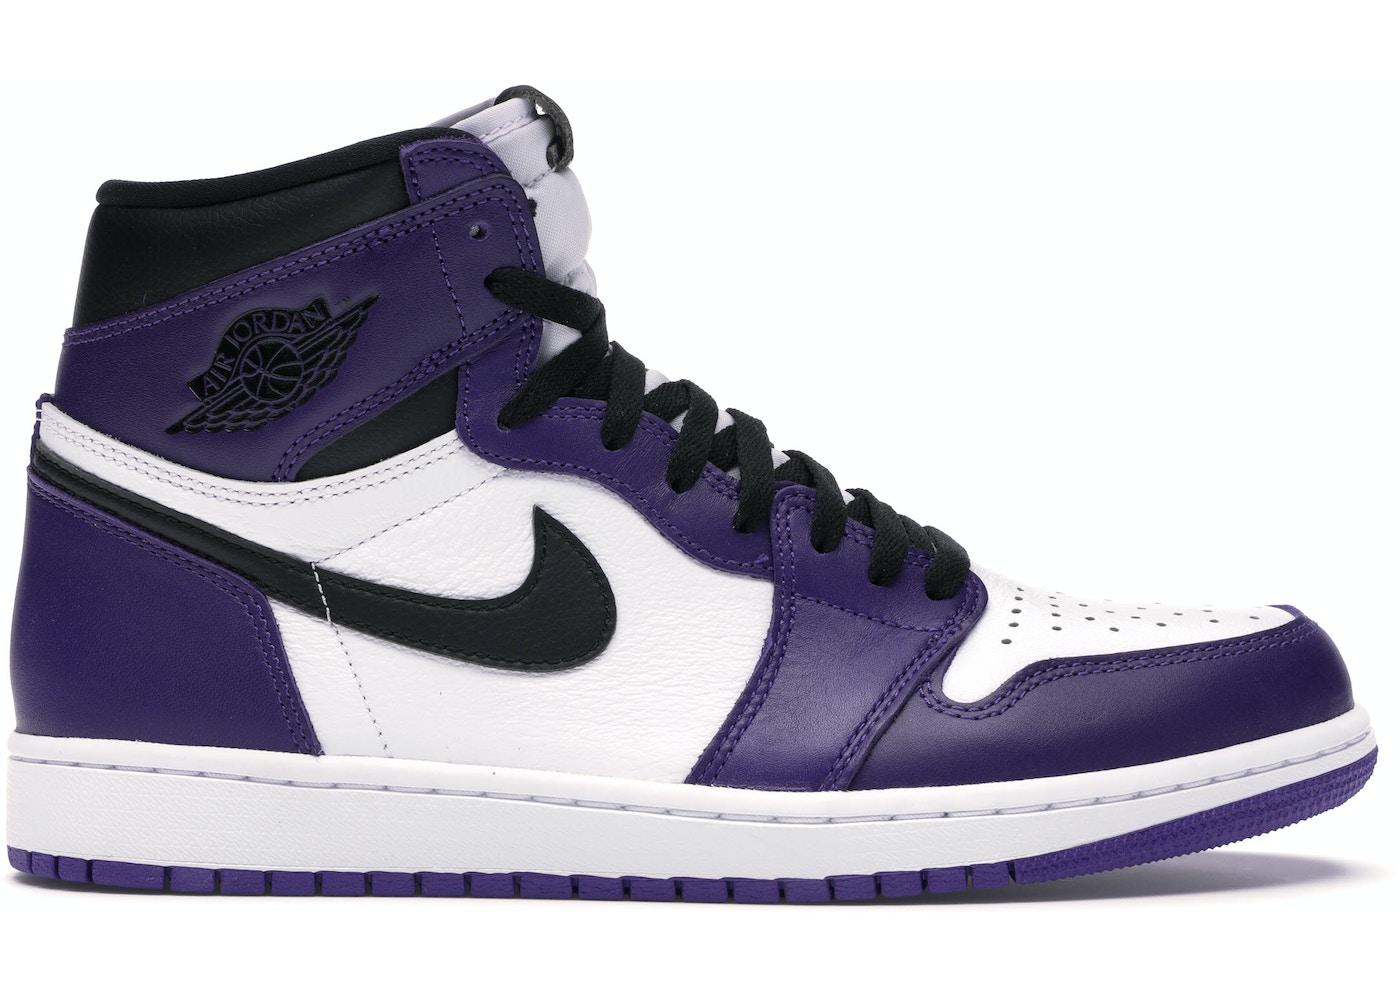 Jordan 1 Retro High Court Purple White 555088 500